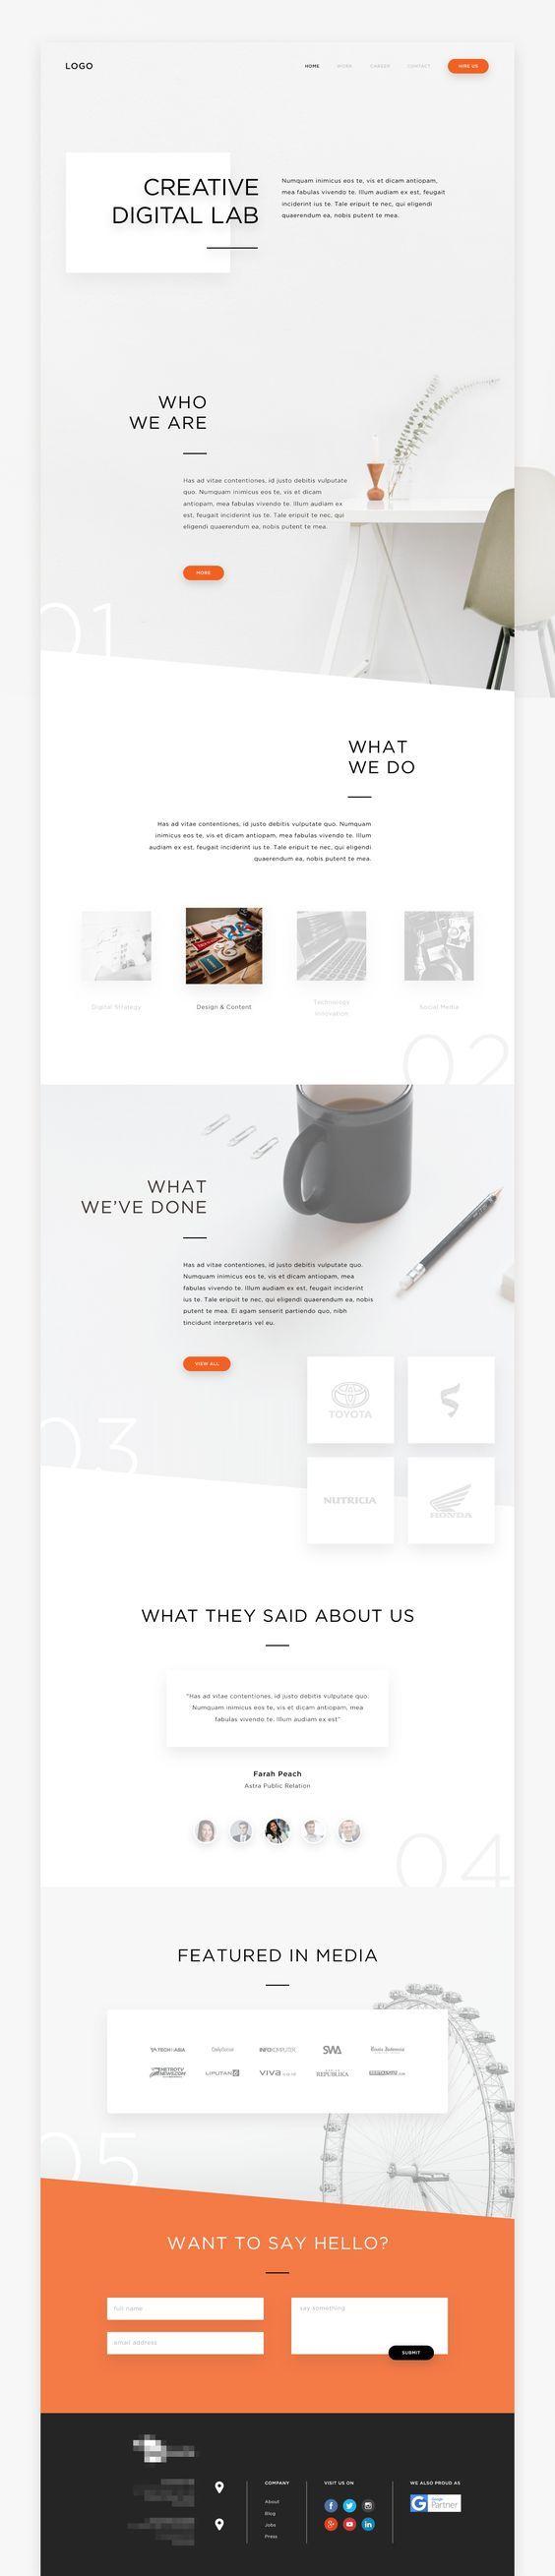 Creative Digital Lab - #webdesign #inspiration: